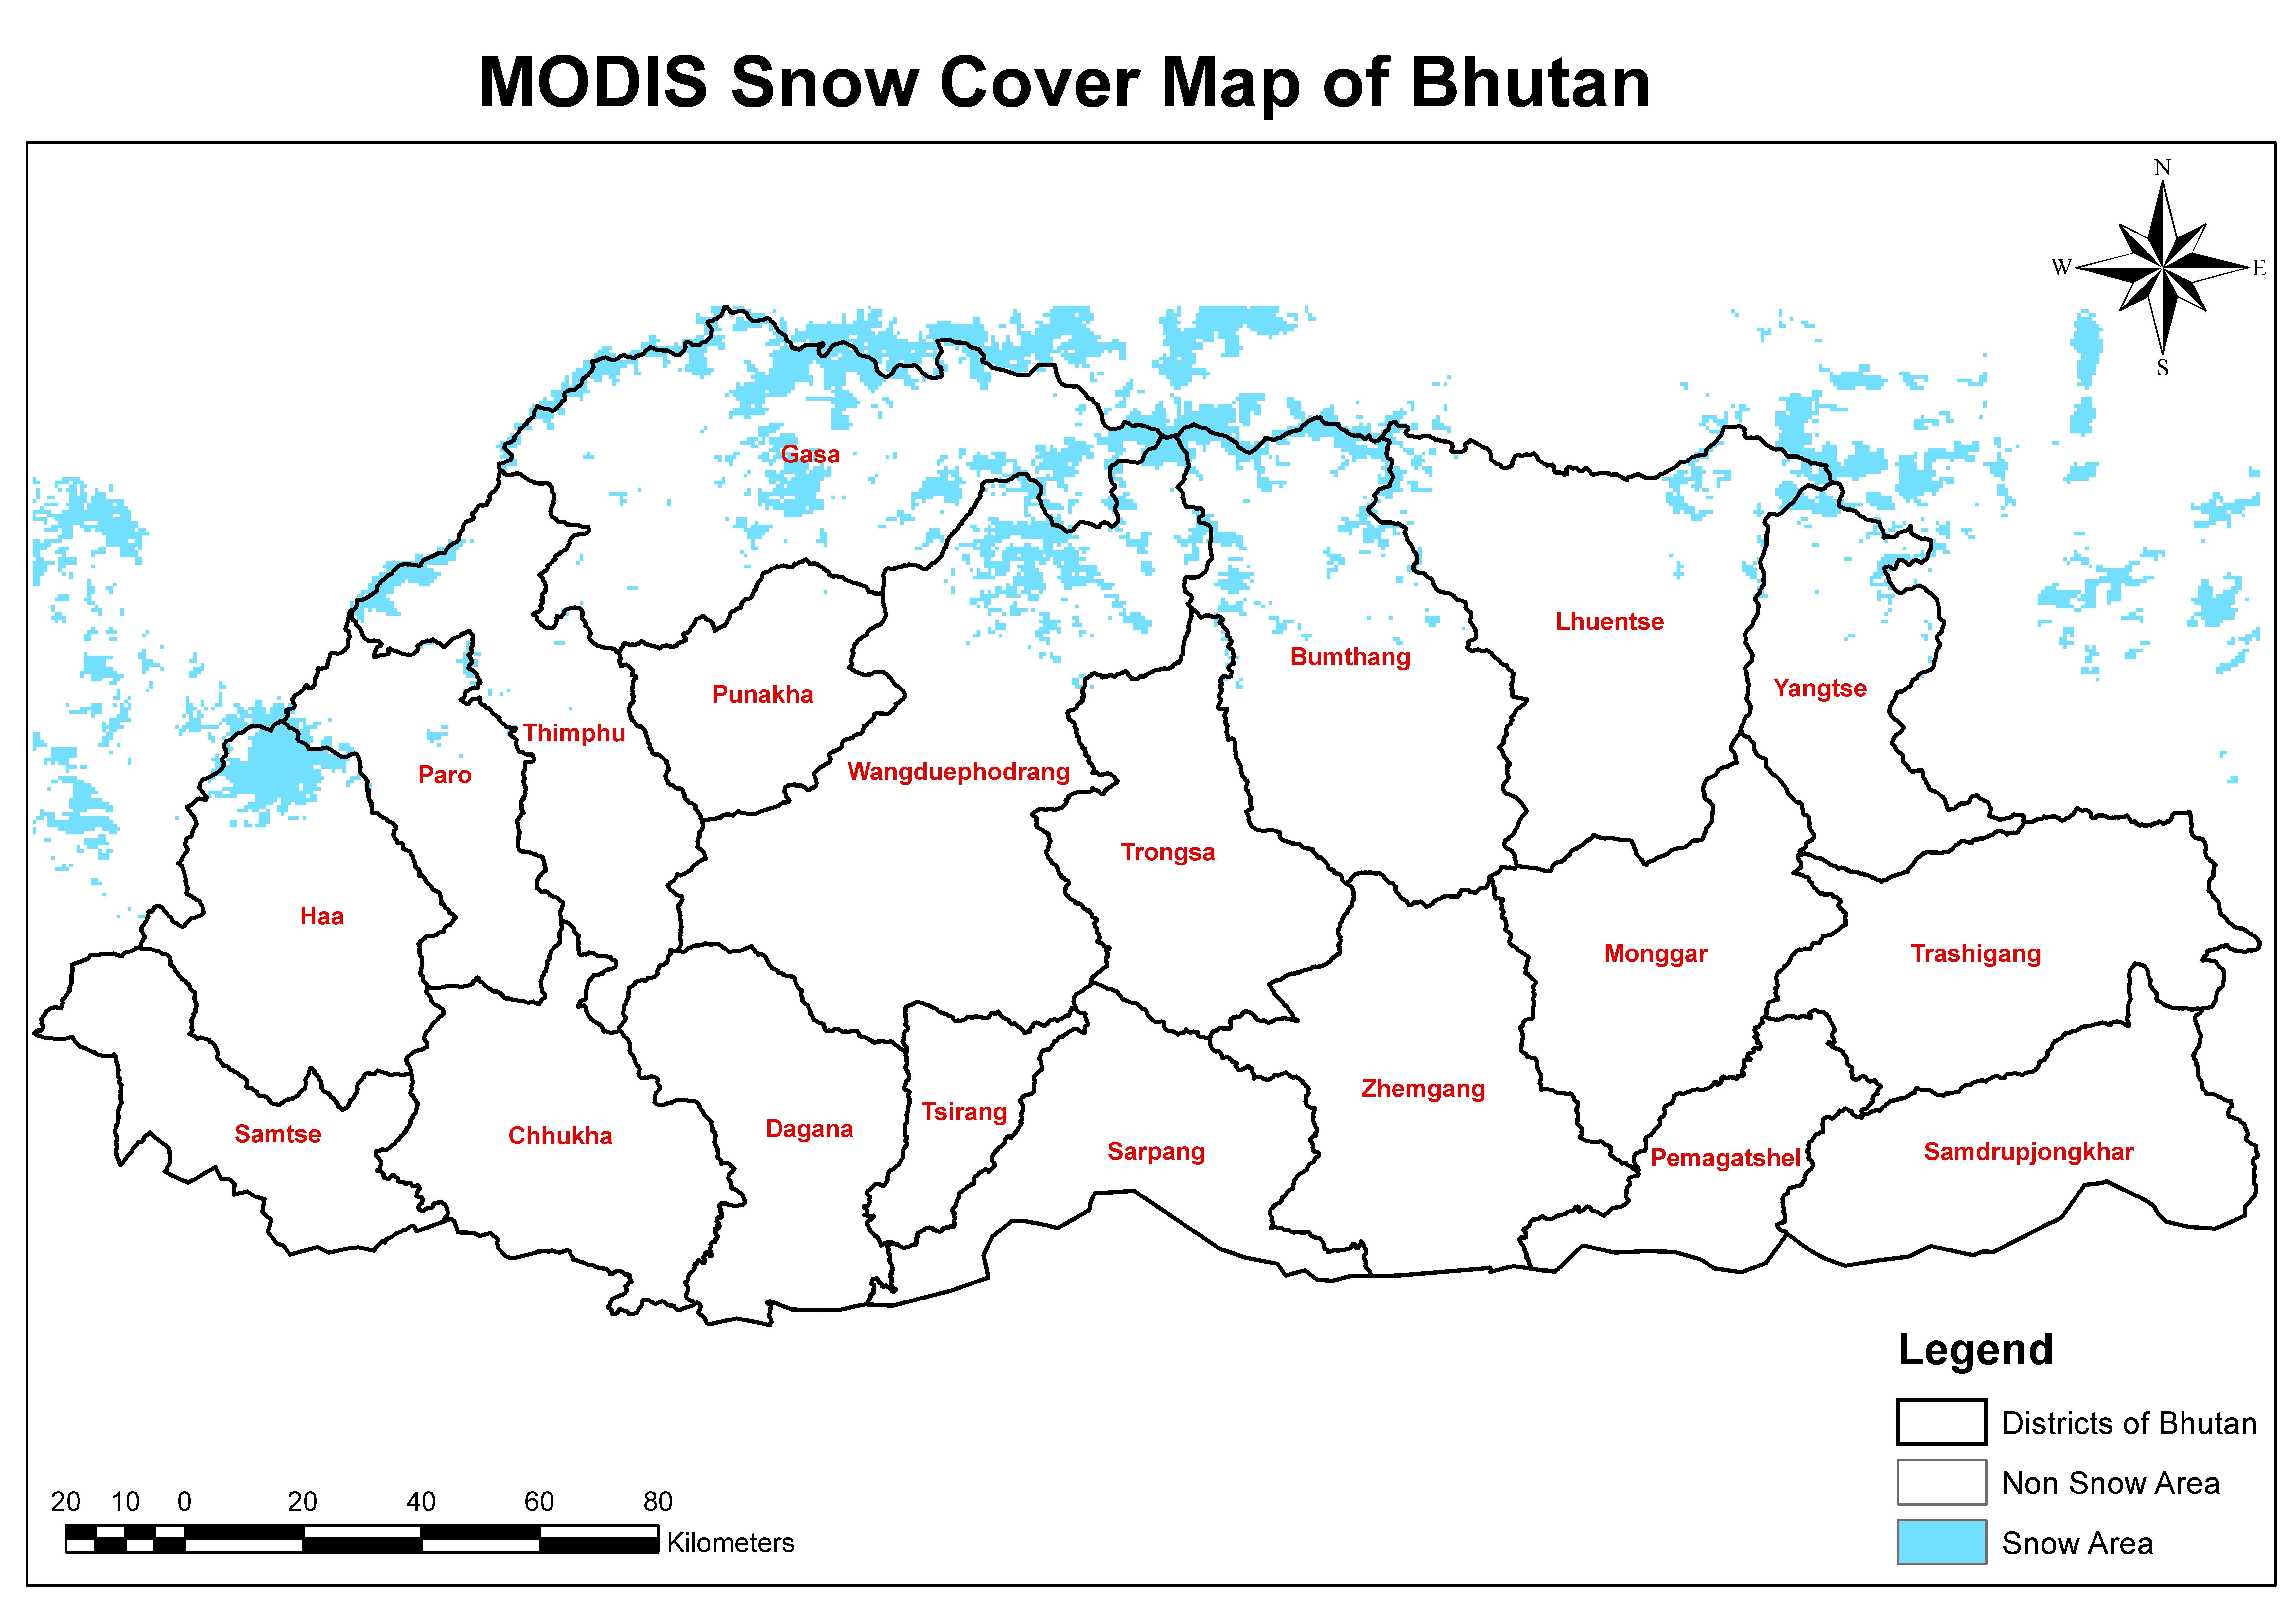 nasa modis environmental data from servir himalaya to help modis snow cover map